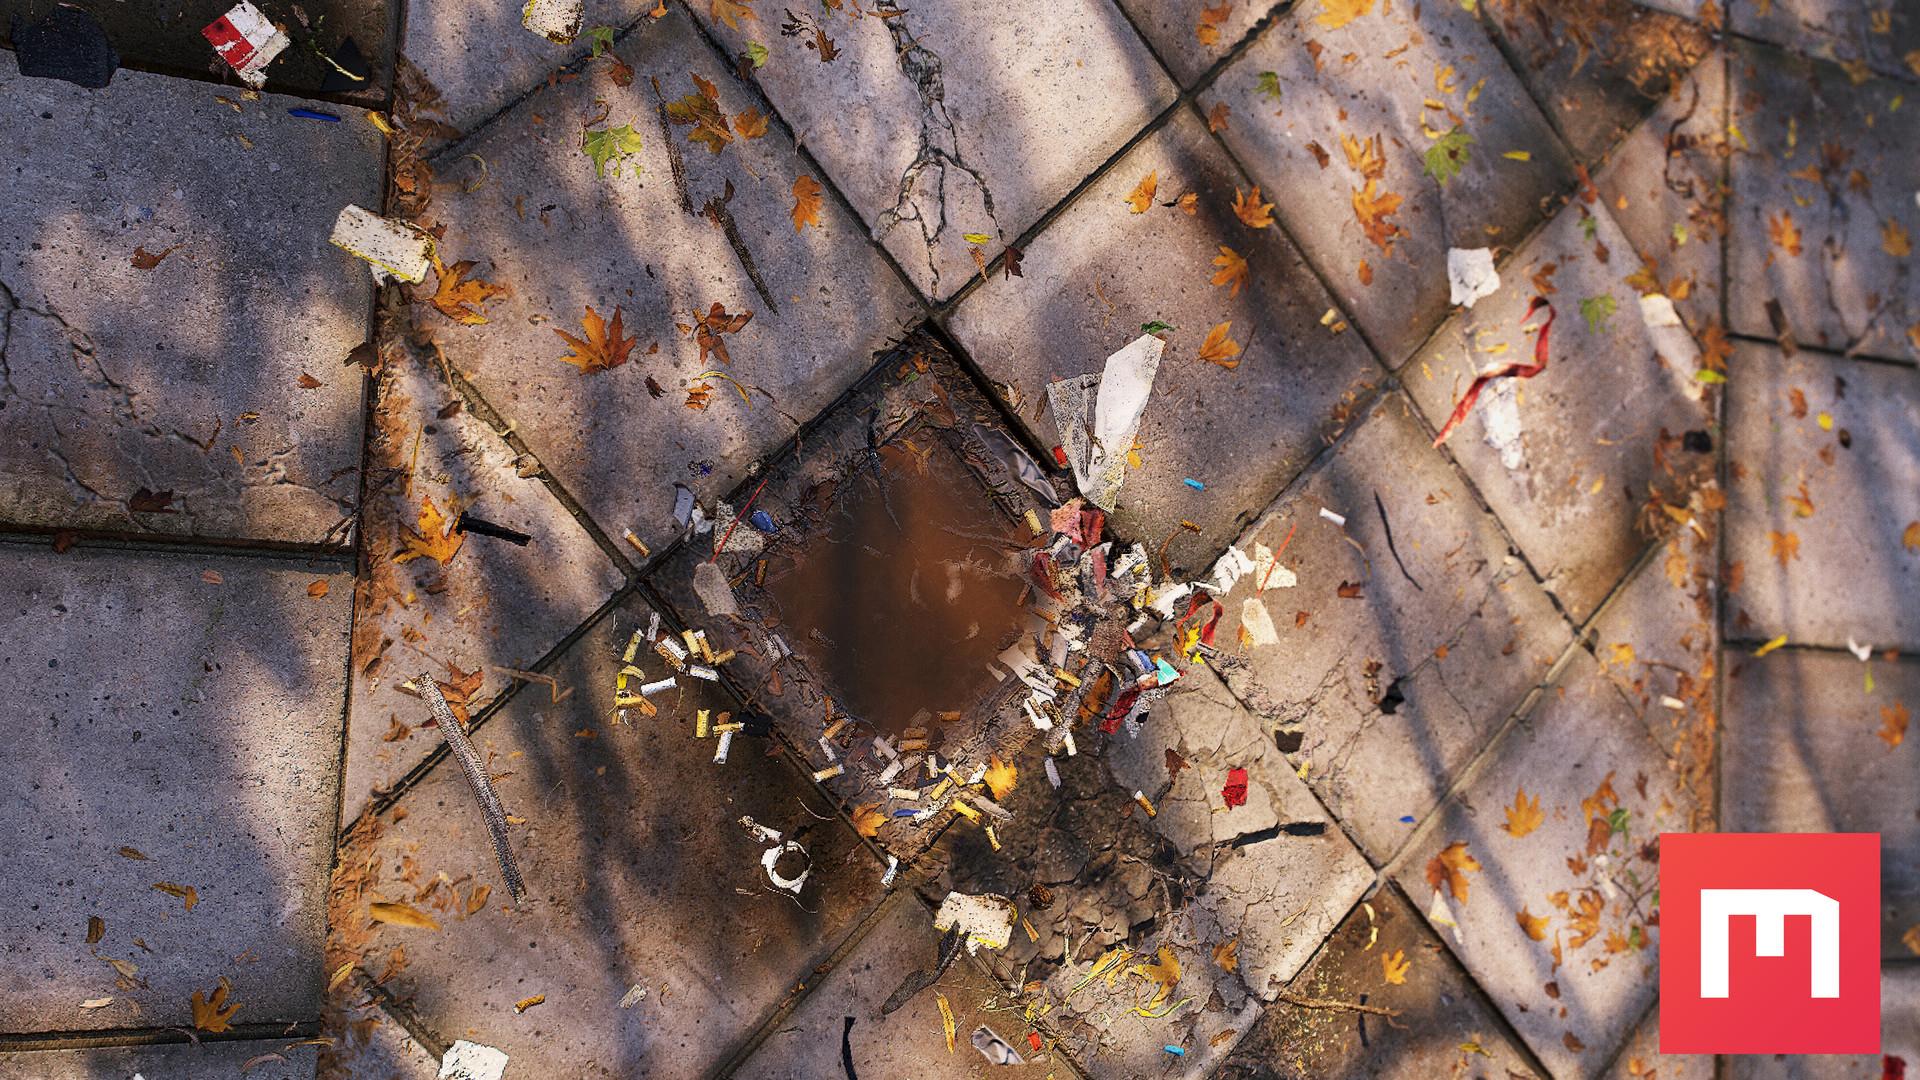 Josh Powers - Freelance Artist - [TUTORIAL] Damaged Concrete